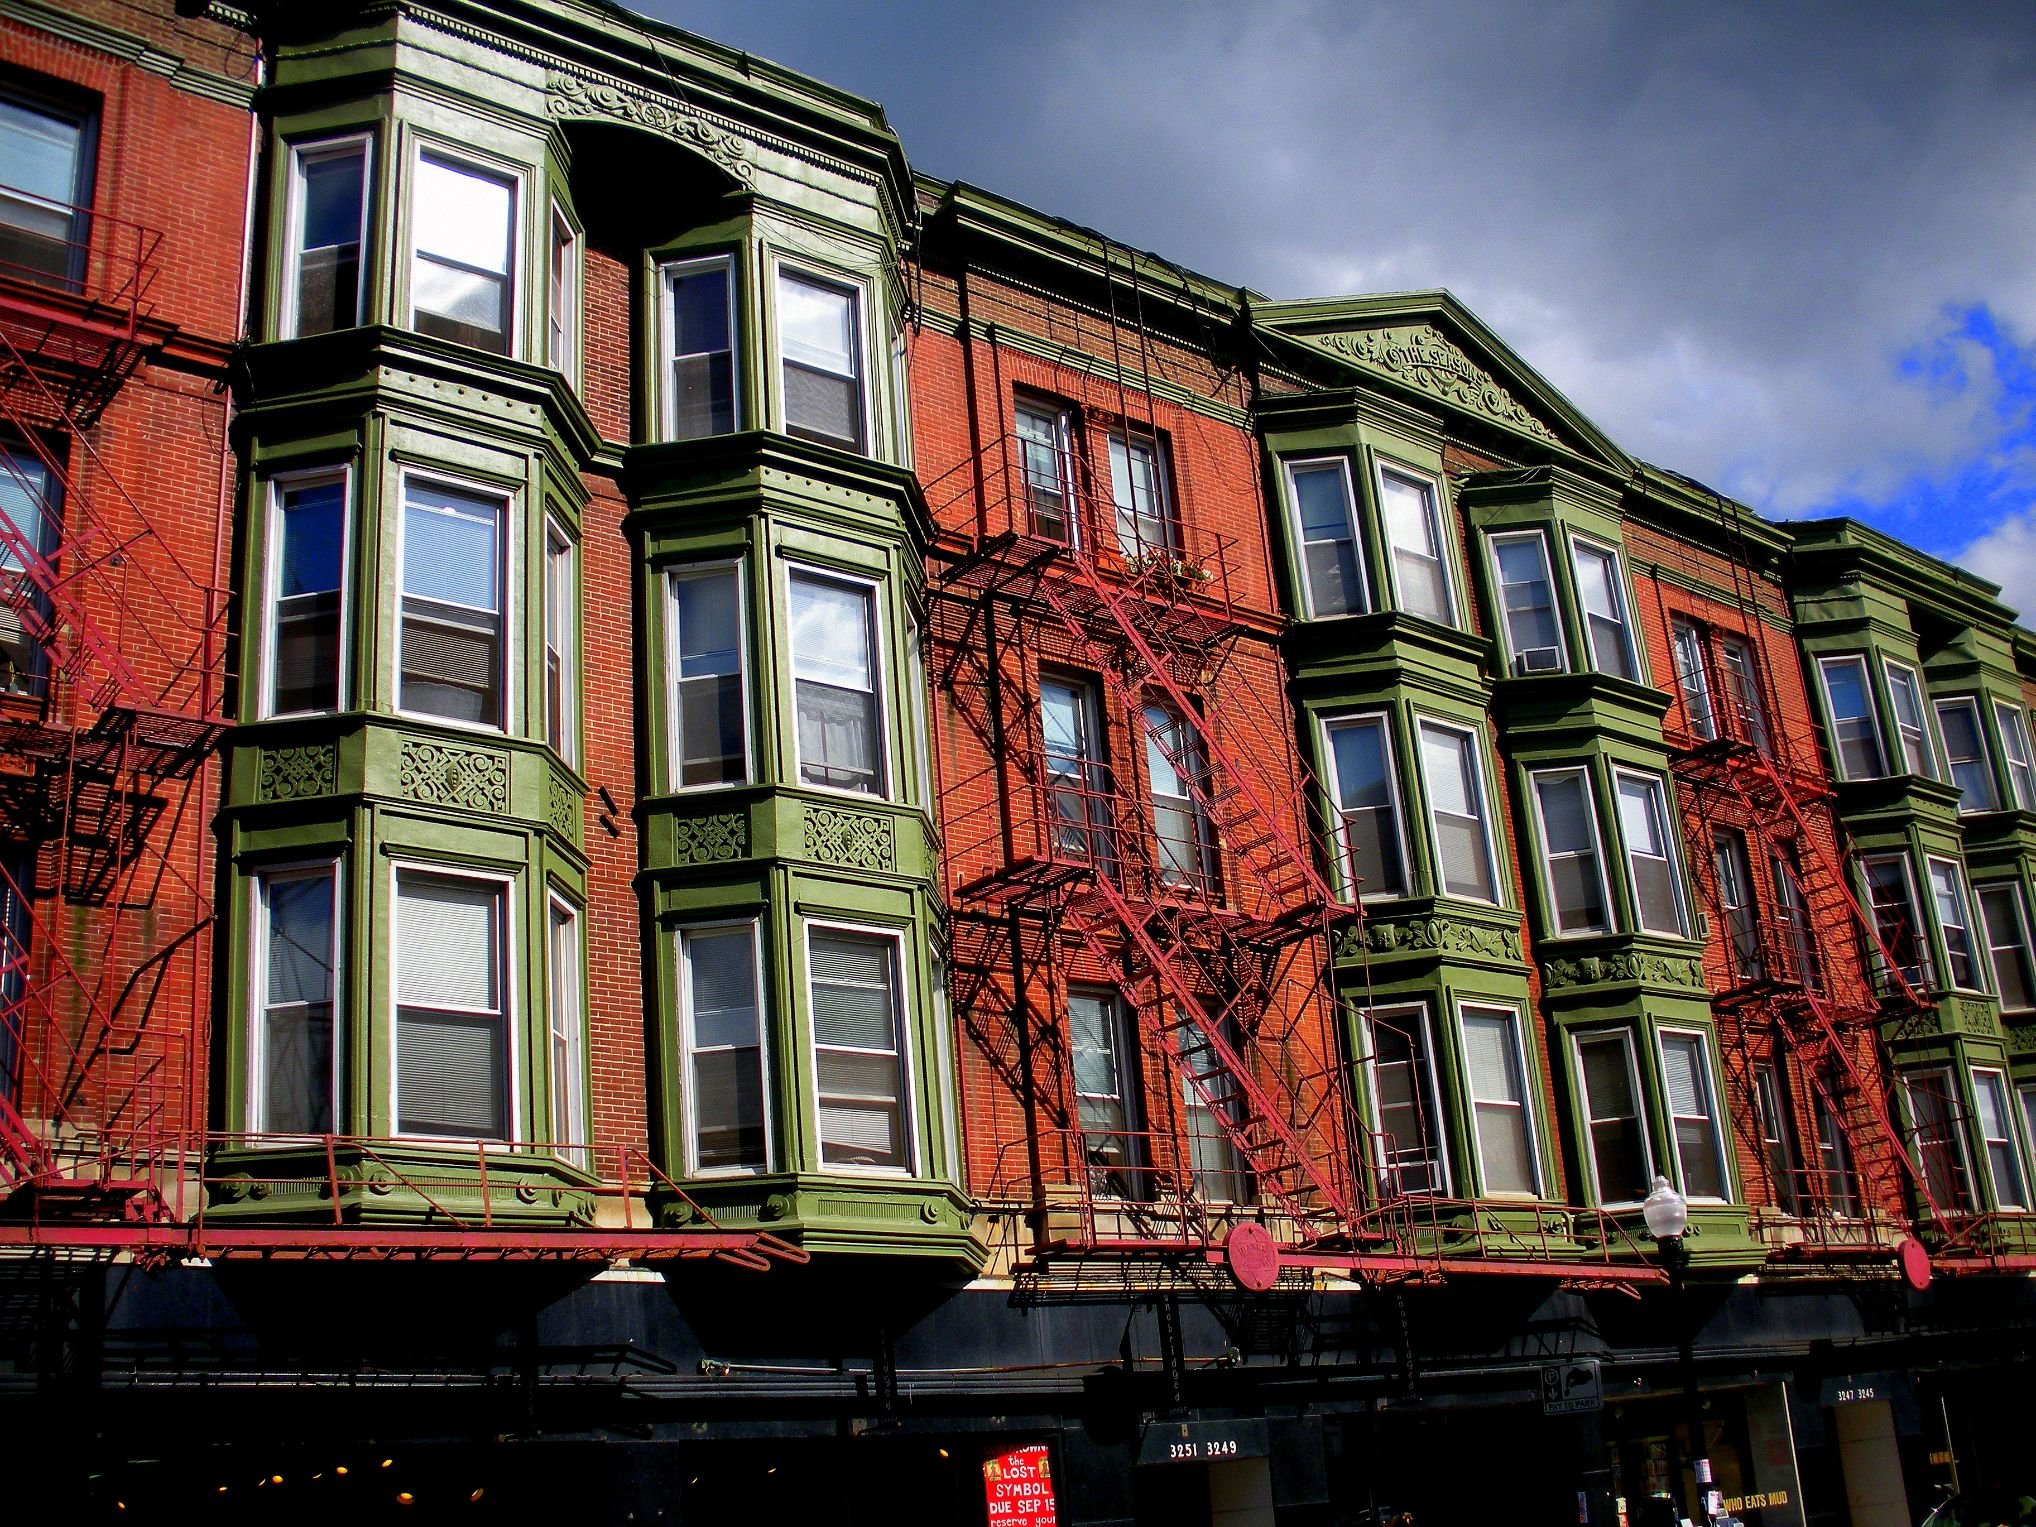 Building-on-Broadway-Belmont-2-1